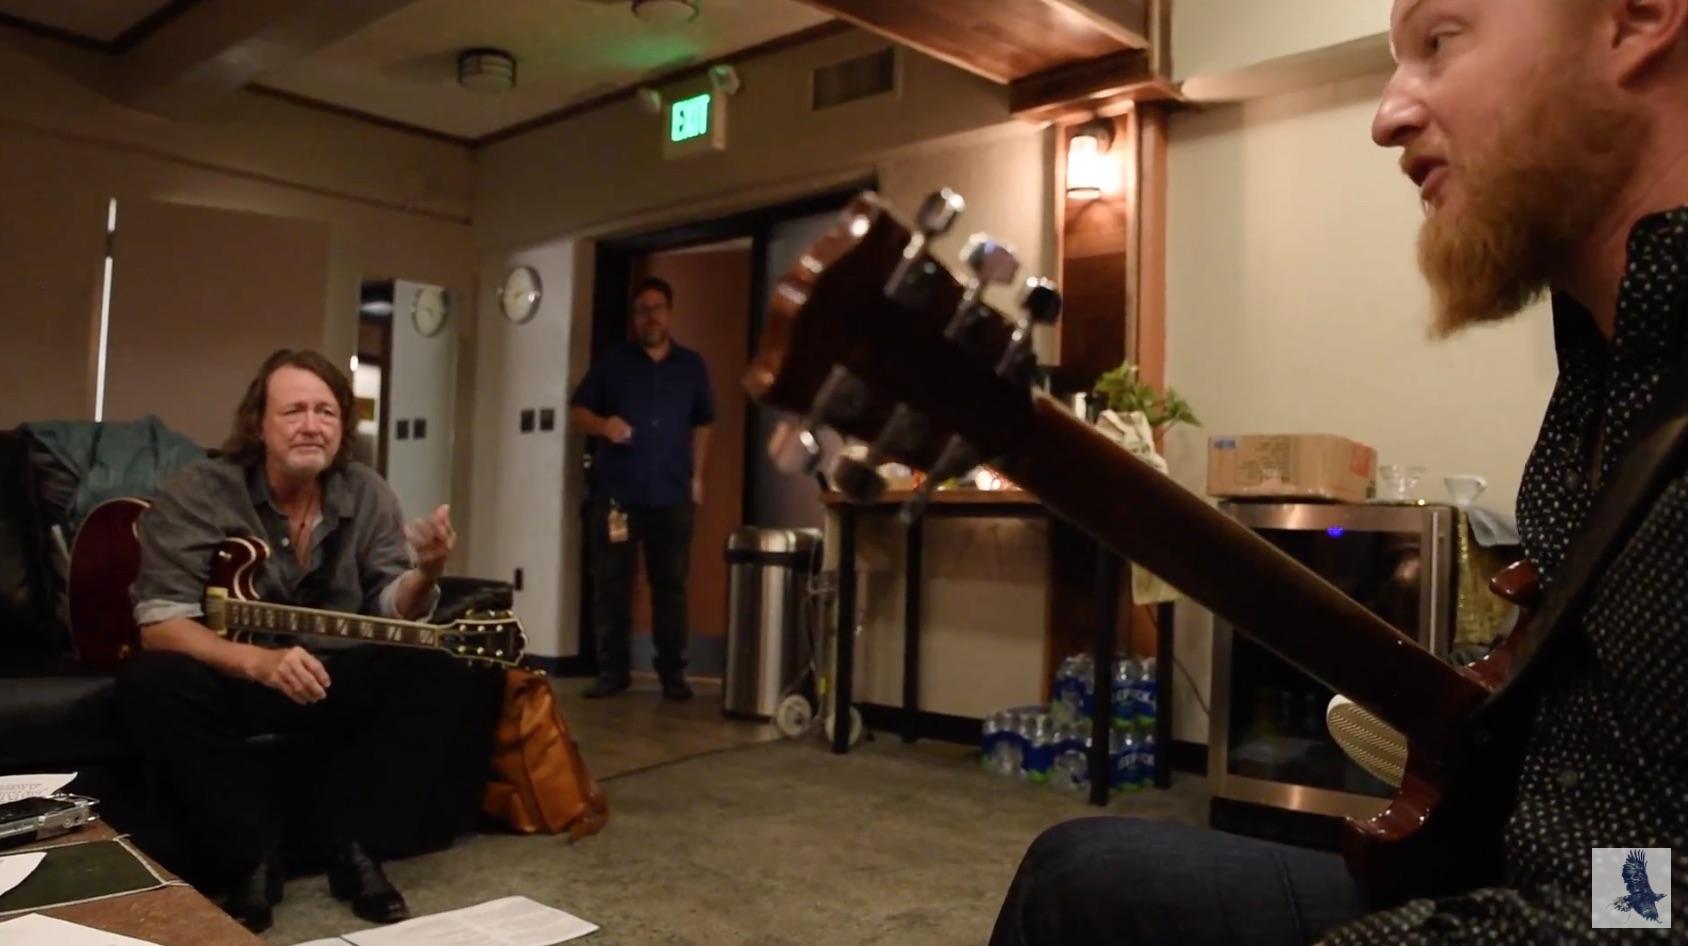 On TV | John Bell & Tedeschi Trucks Band Rehearse 'Dark End Of The Street'